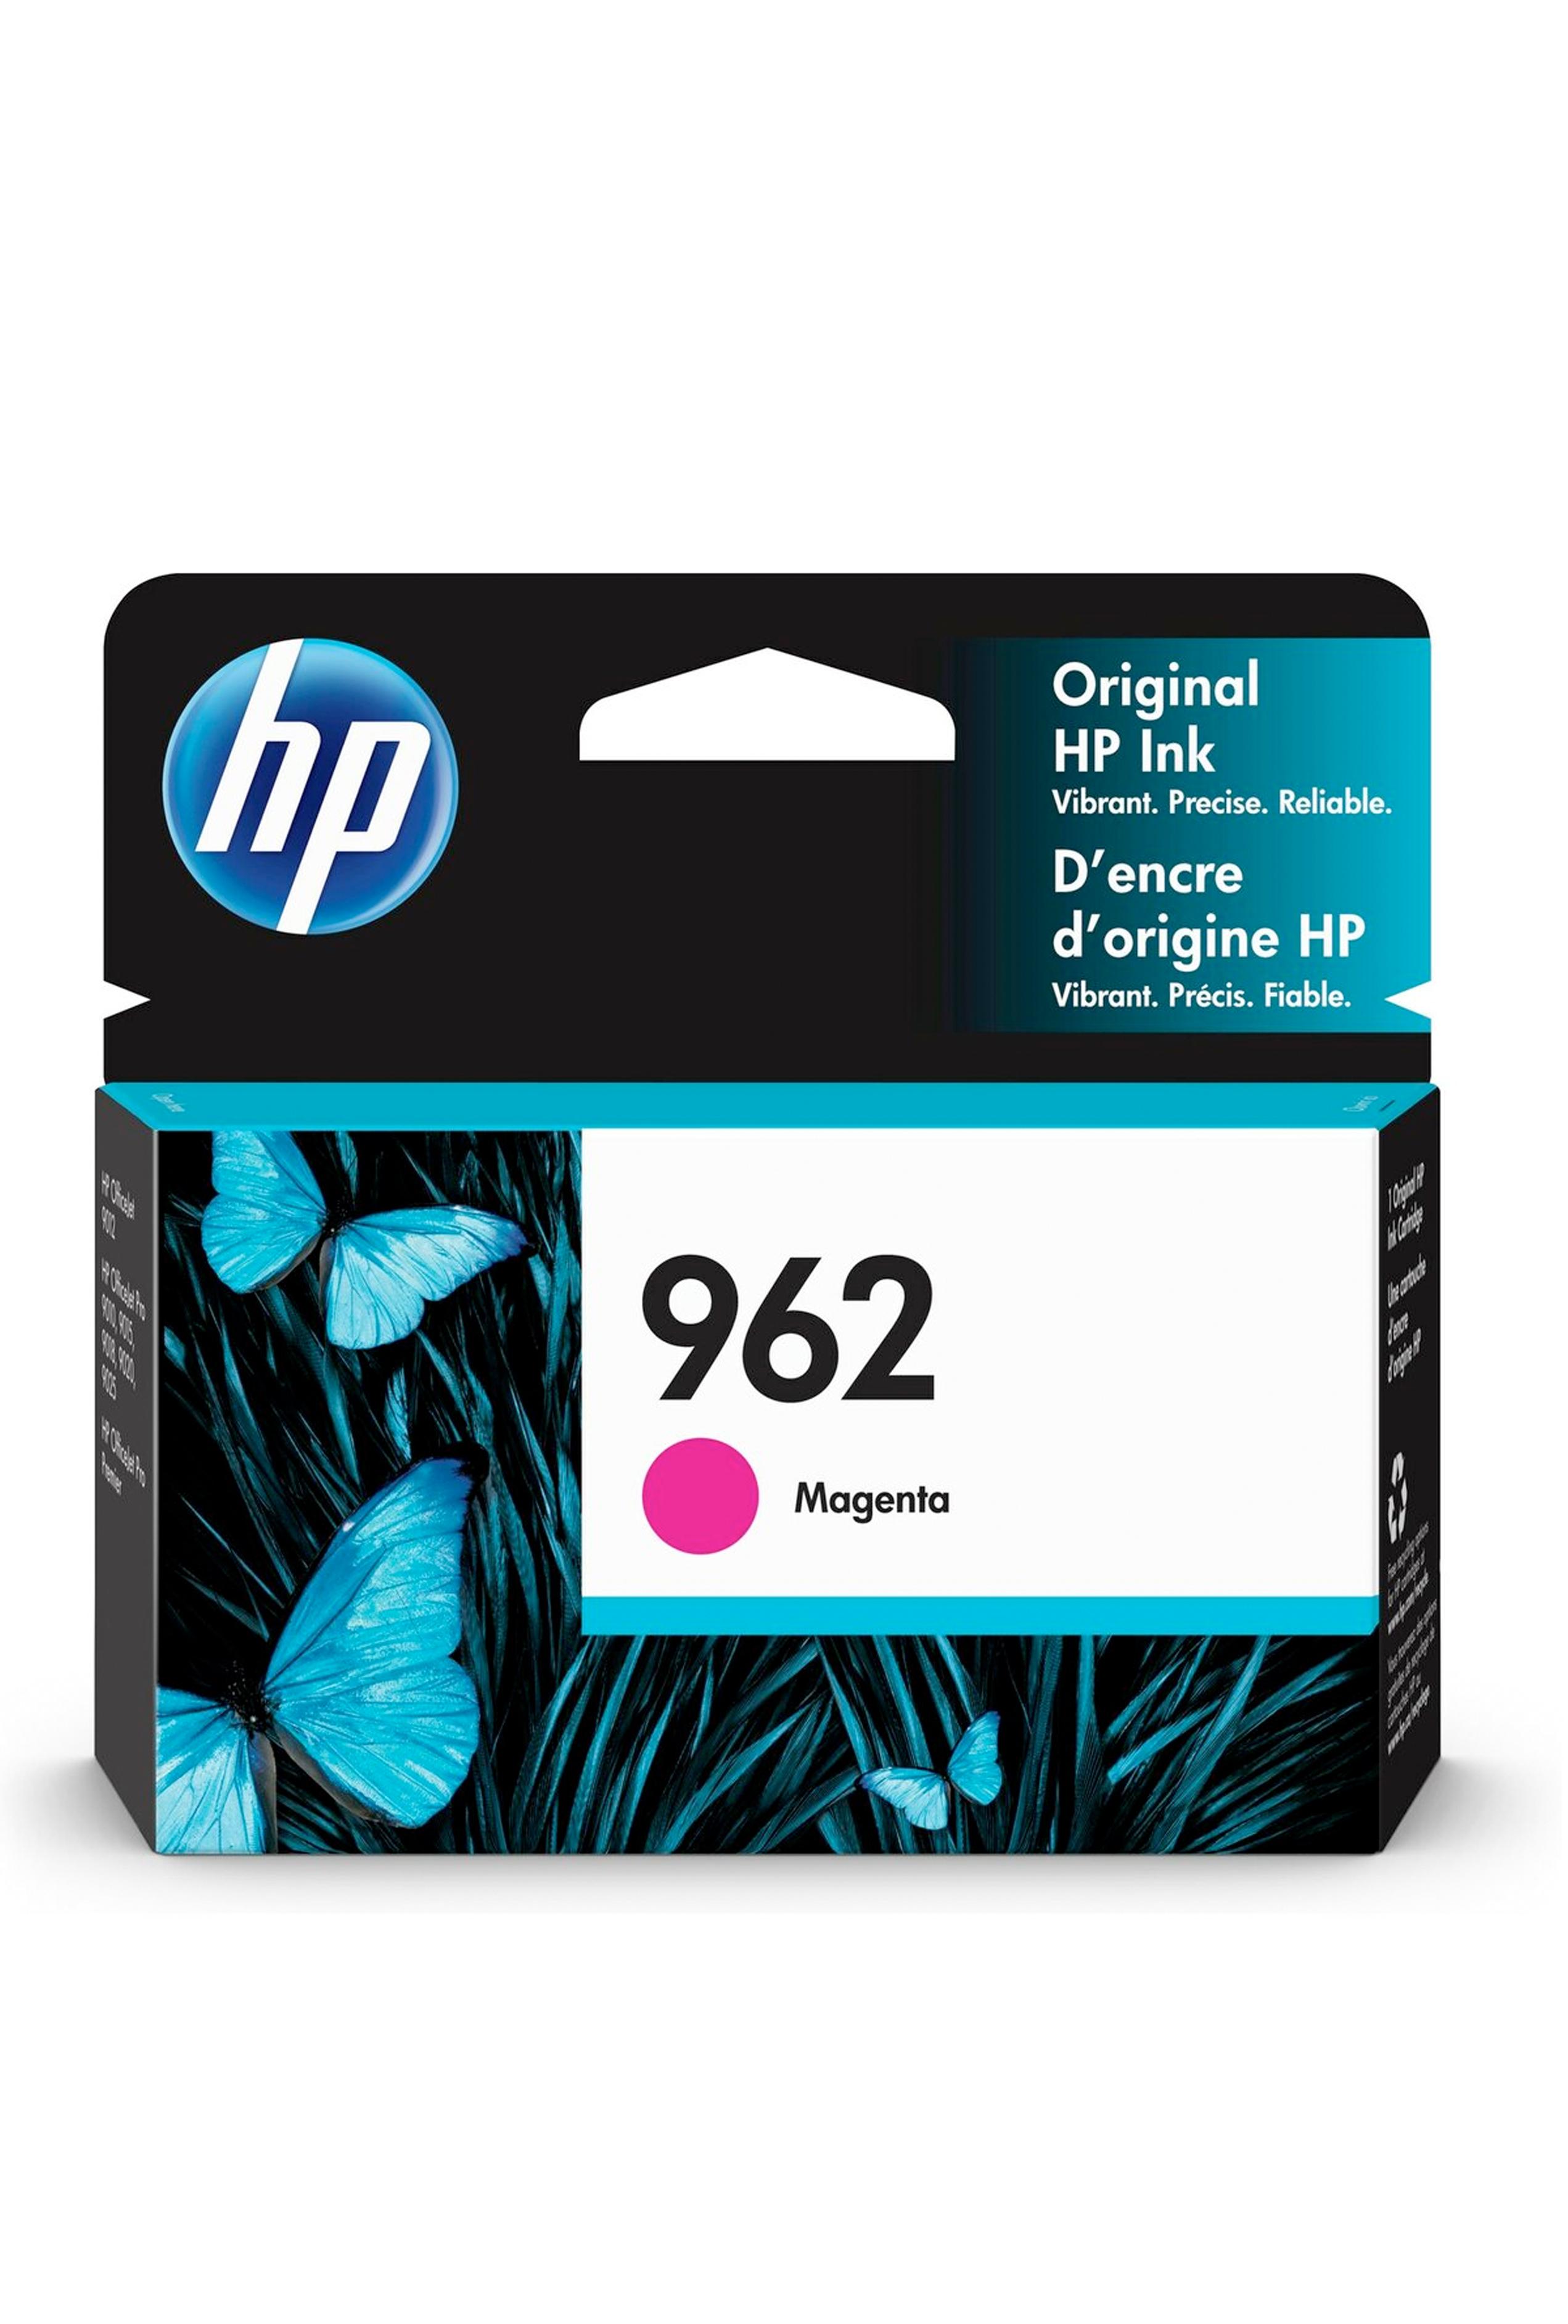 HP 962 MAGENTA ORIGINAL CARTRIDGE (700 YIELD) (3HZ97AN)